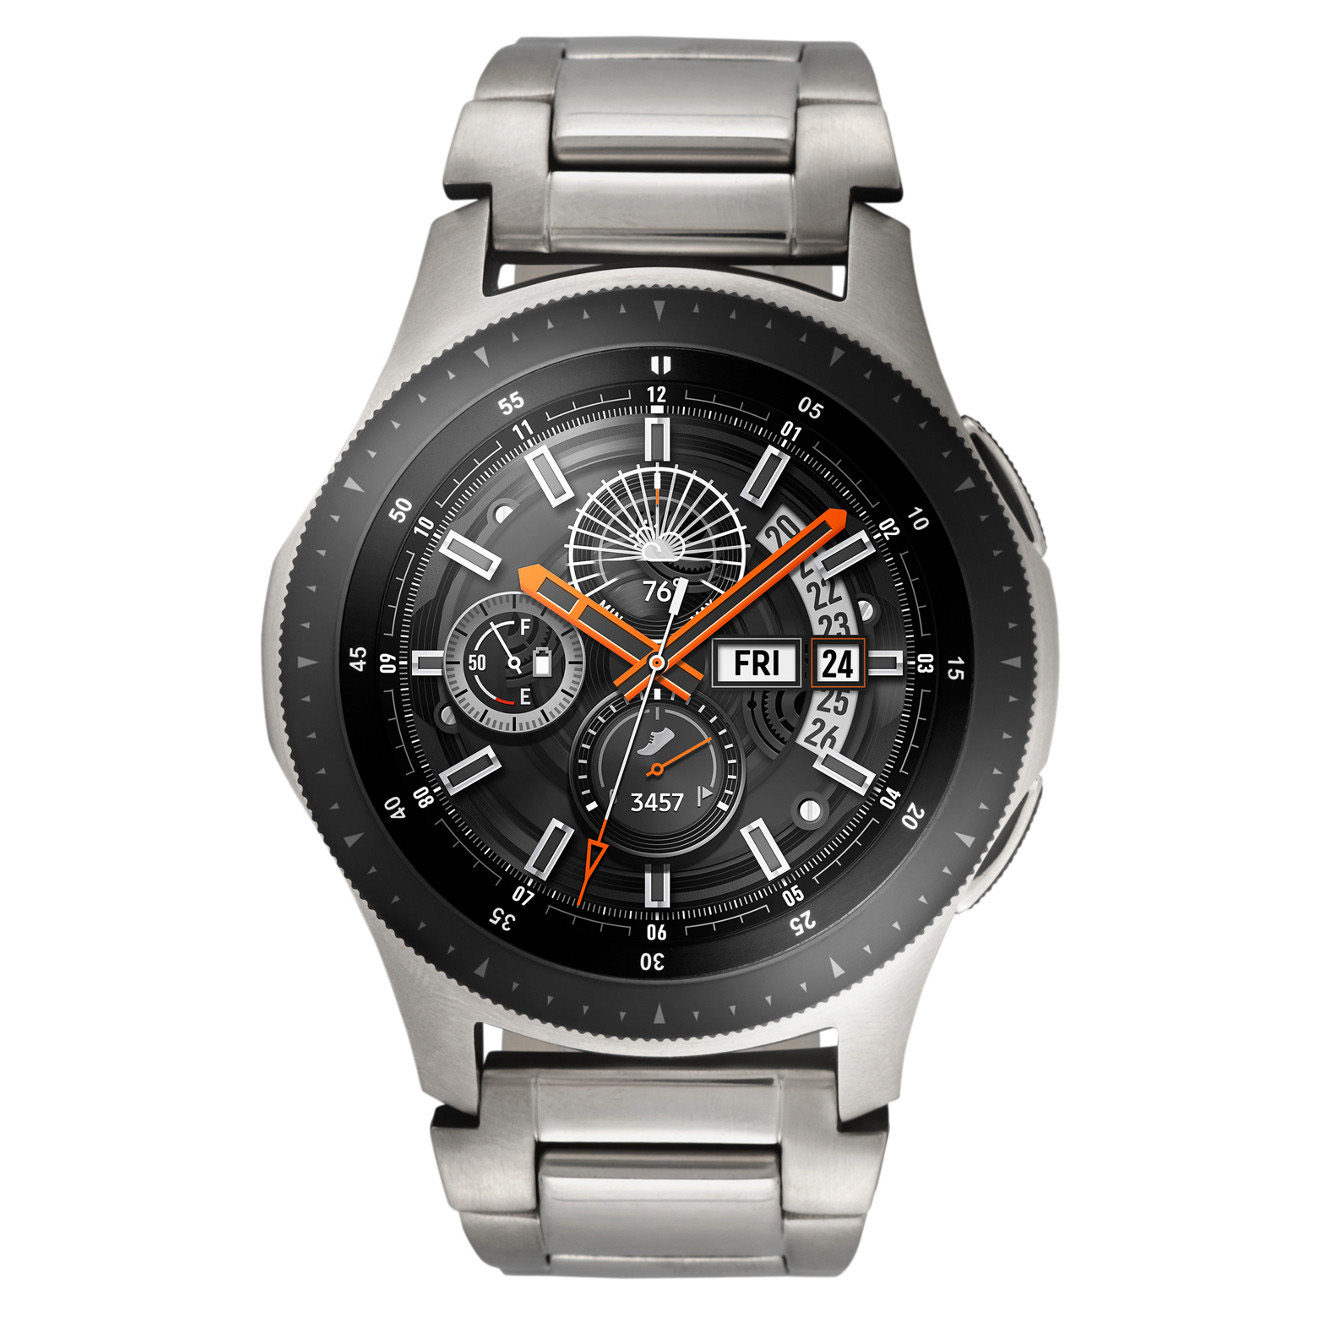 Samsung SA.GASL Watch S3 Smartwatch Special Edition 46 mm